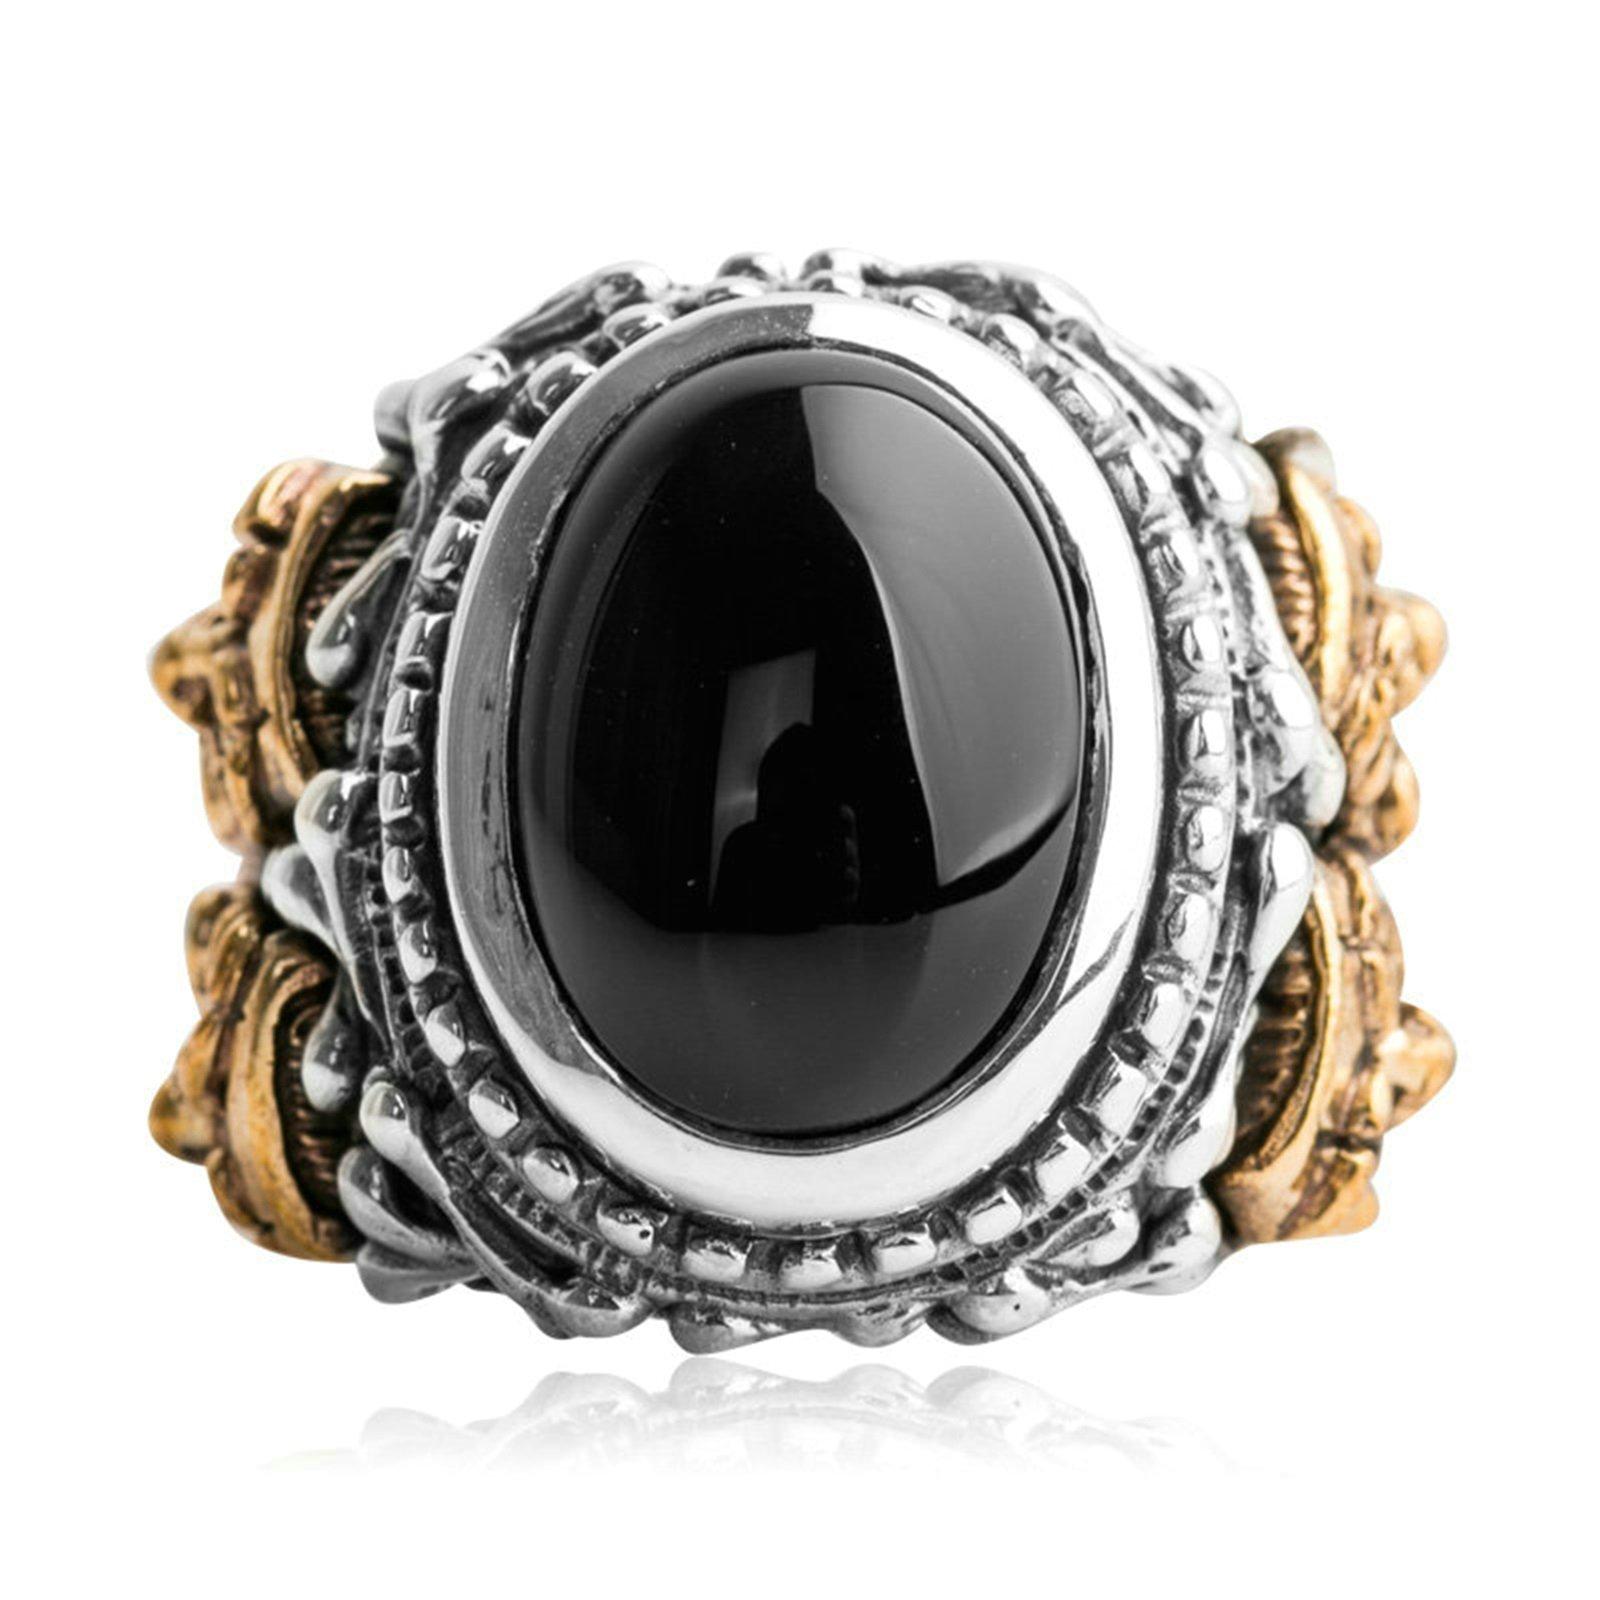 Beydodo Mens Silver Ring, Black Onyx Joker Ring Size 11 Punk Biker Ring Bands by Beydodo